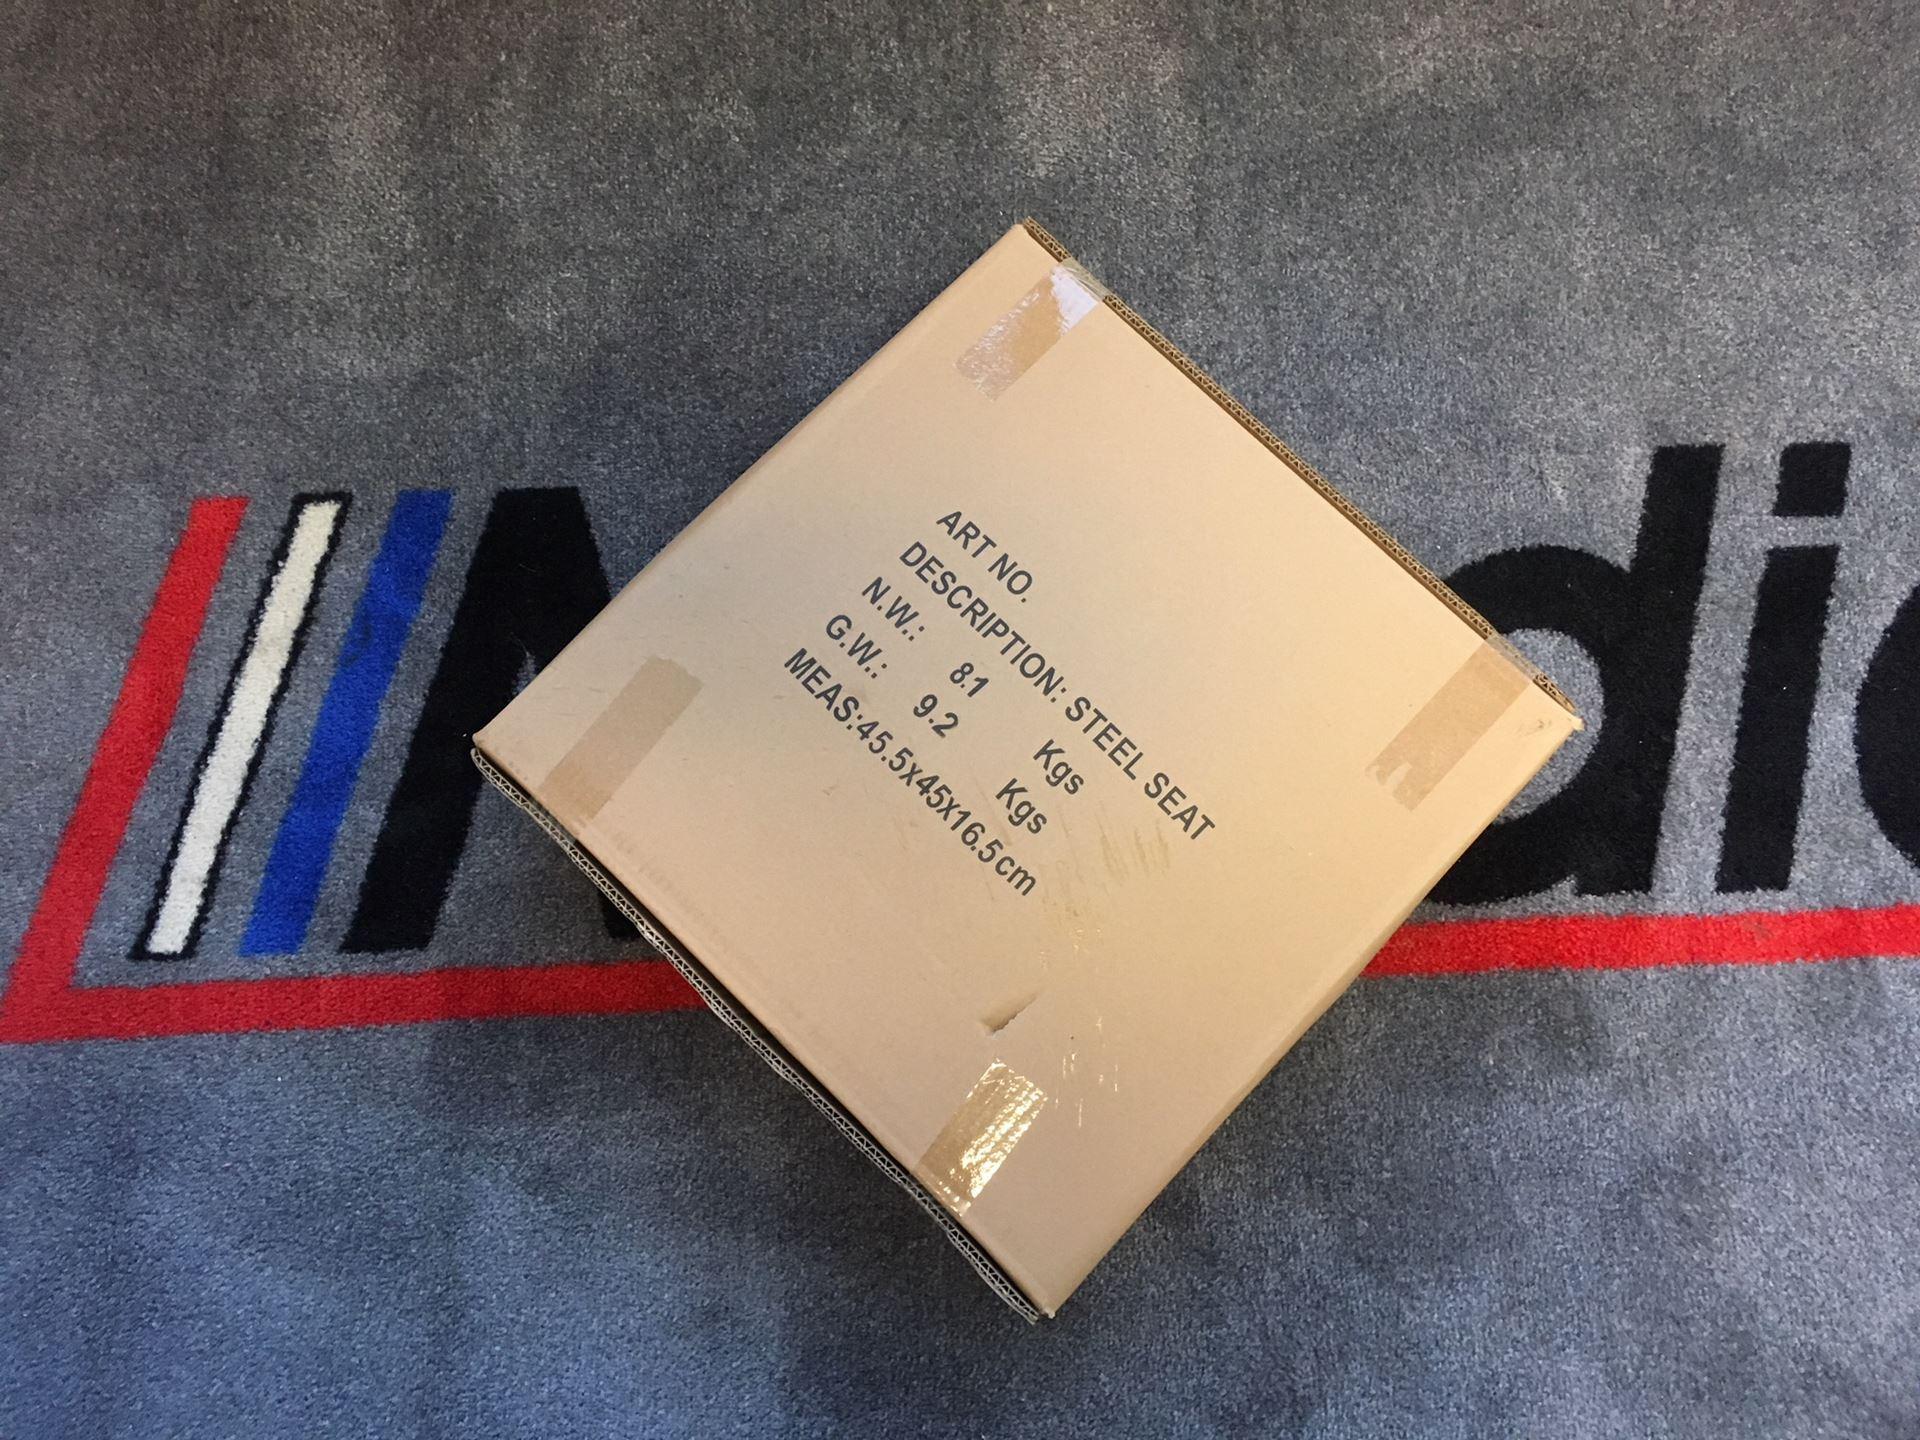 Montørstol for bilmekanikere nordic lift as